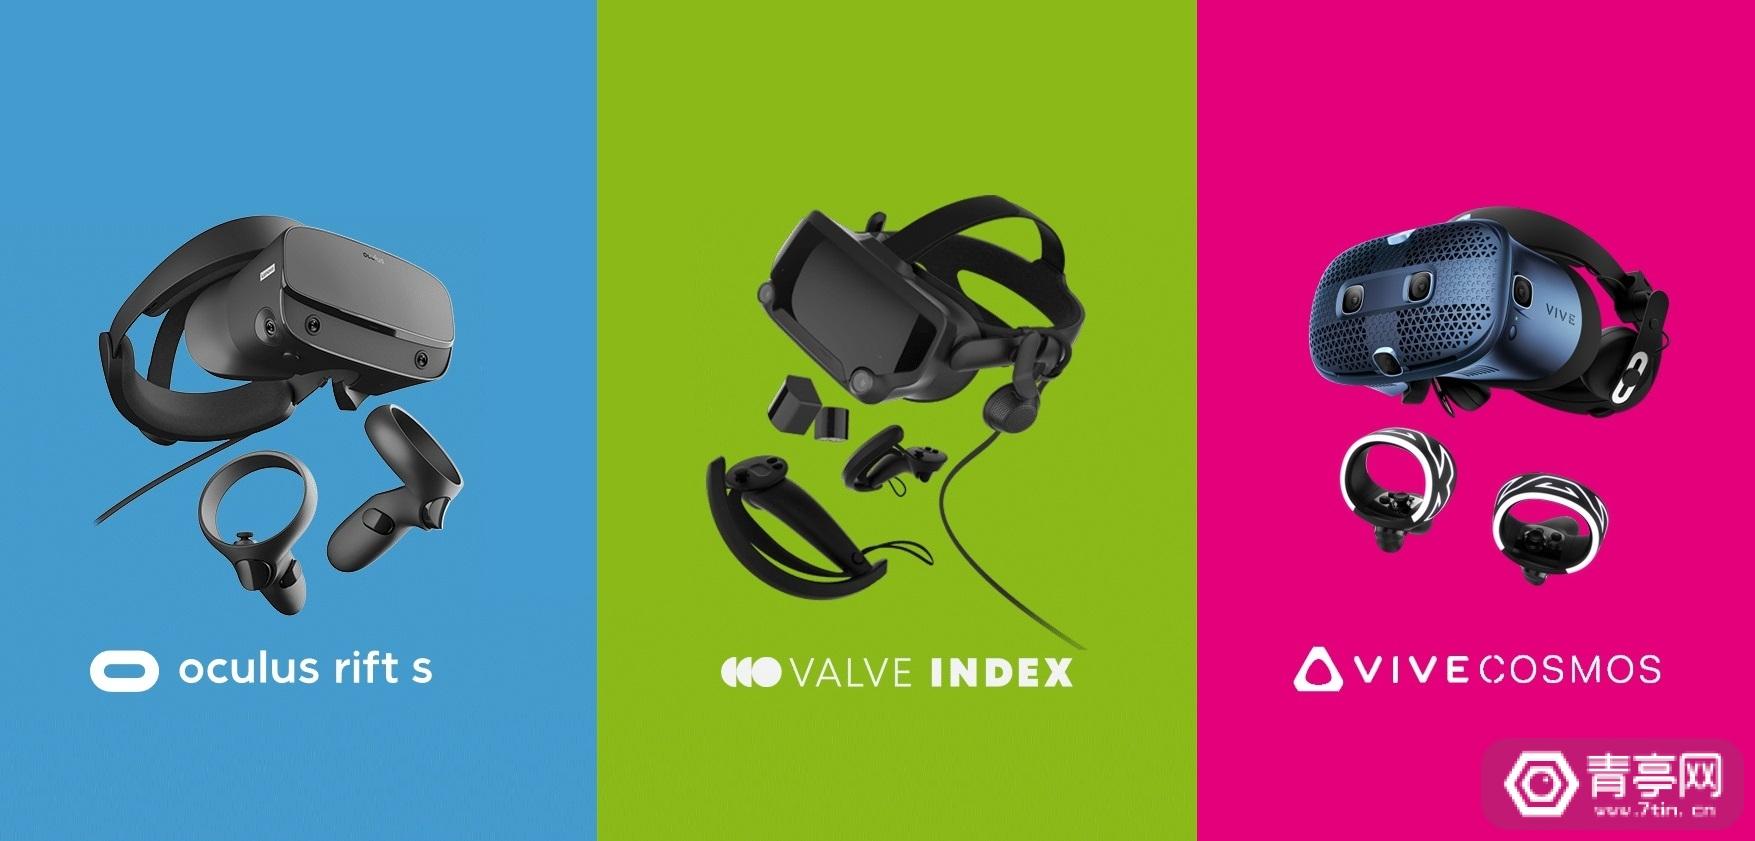 2019:VR这一年之Valve Index/Rift S/Vive Cosmos